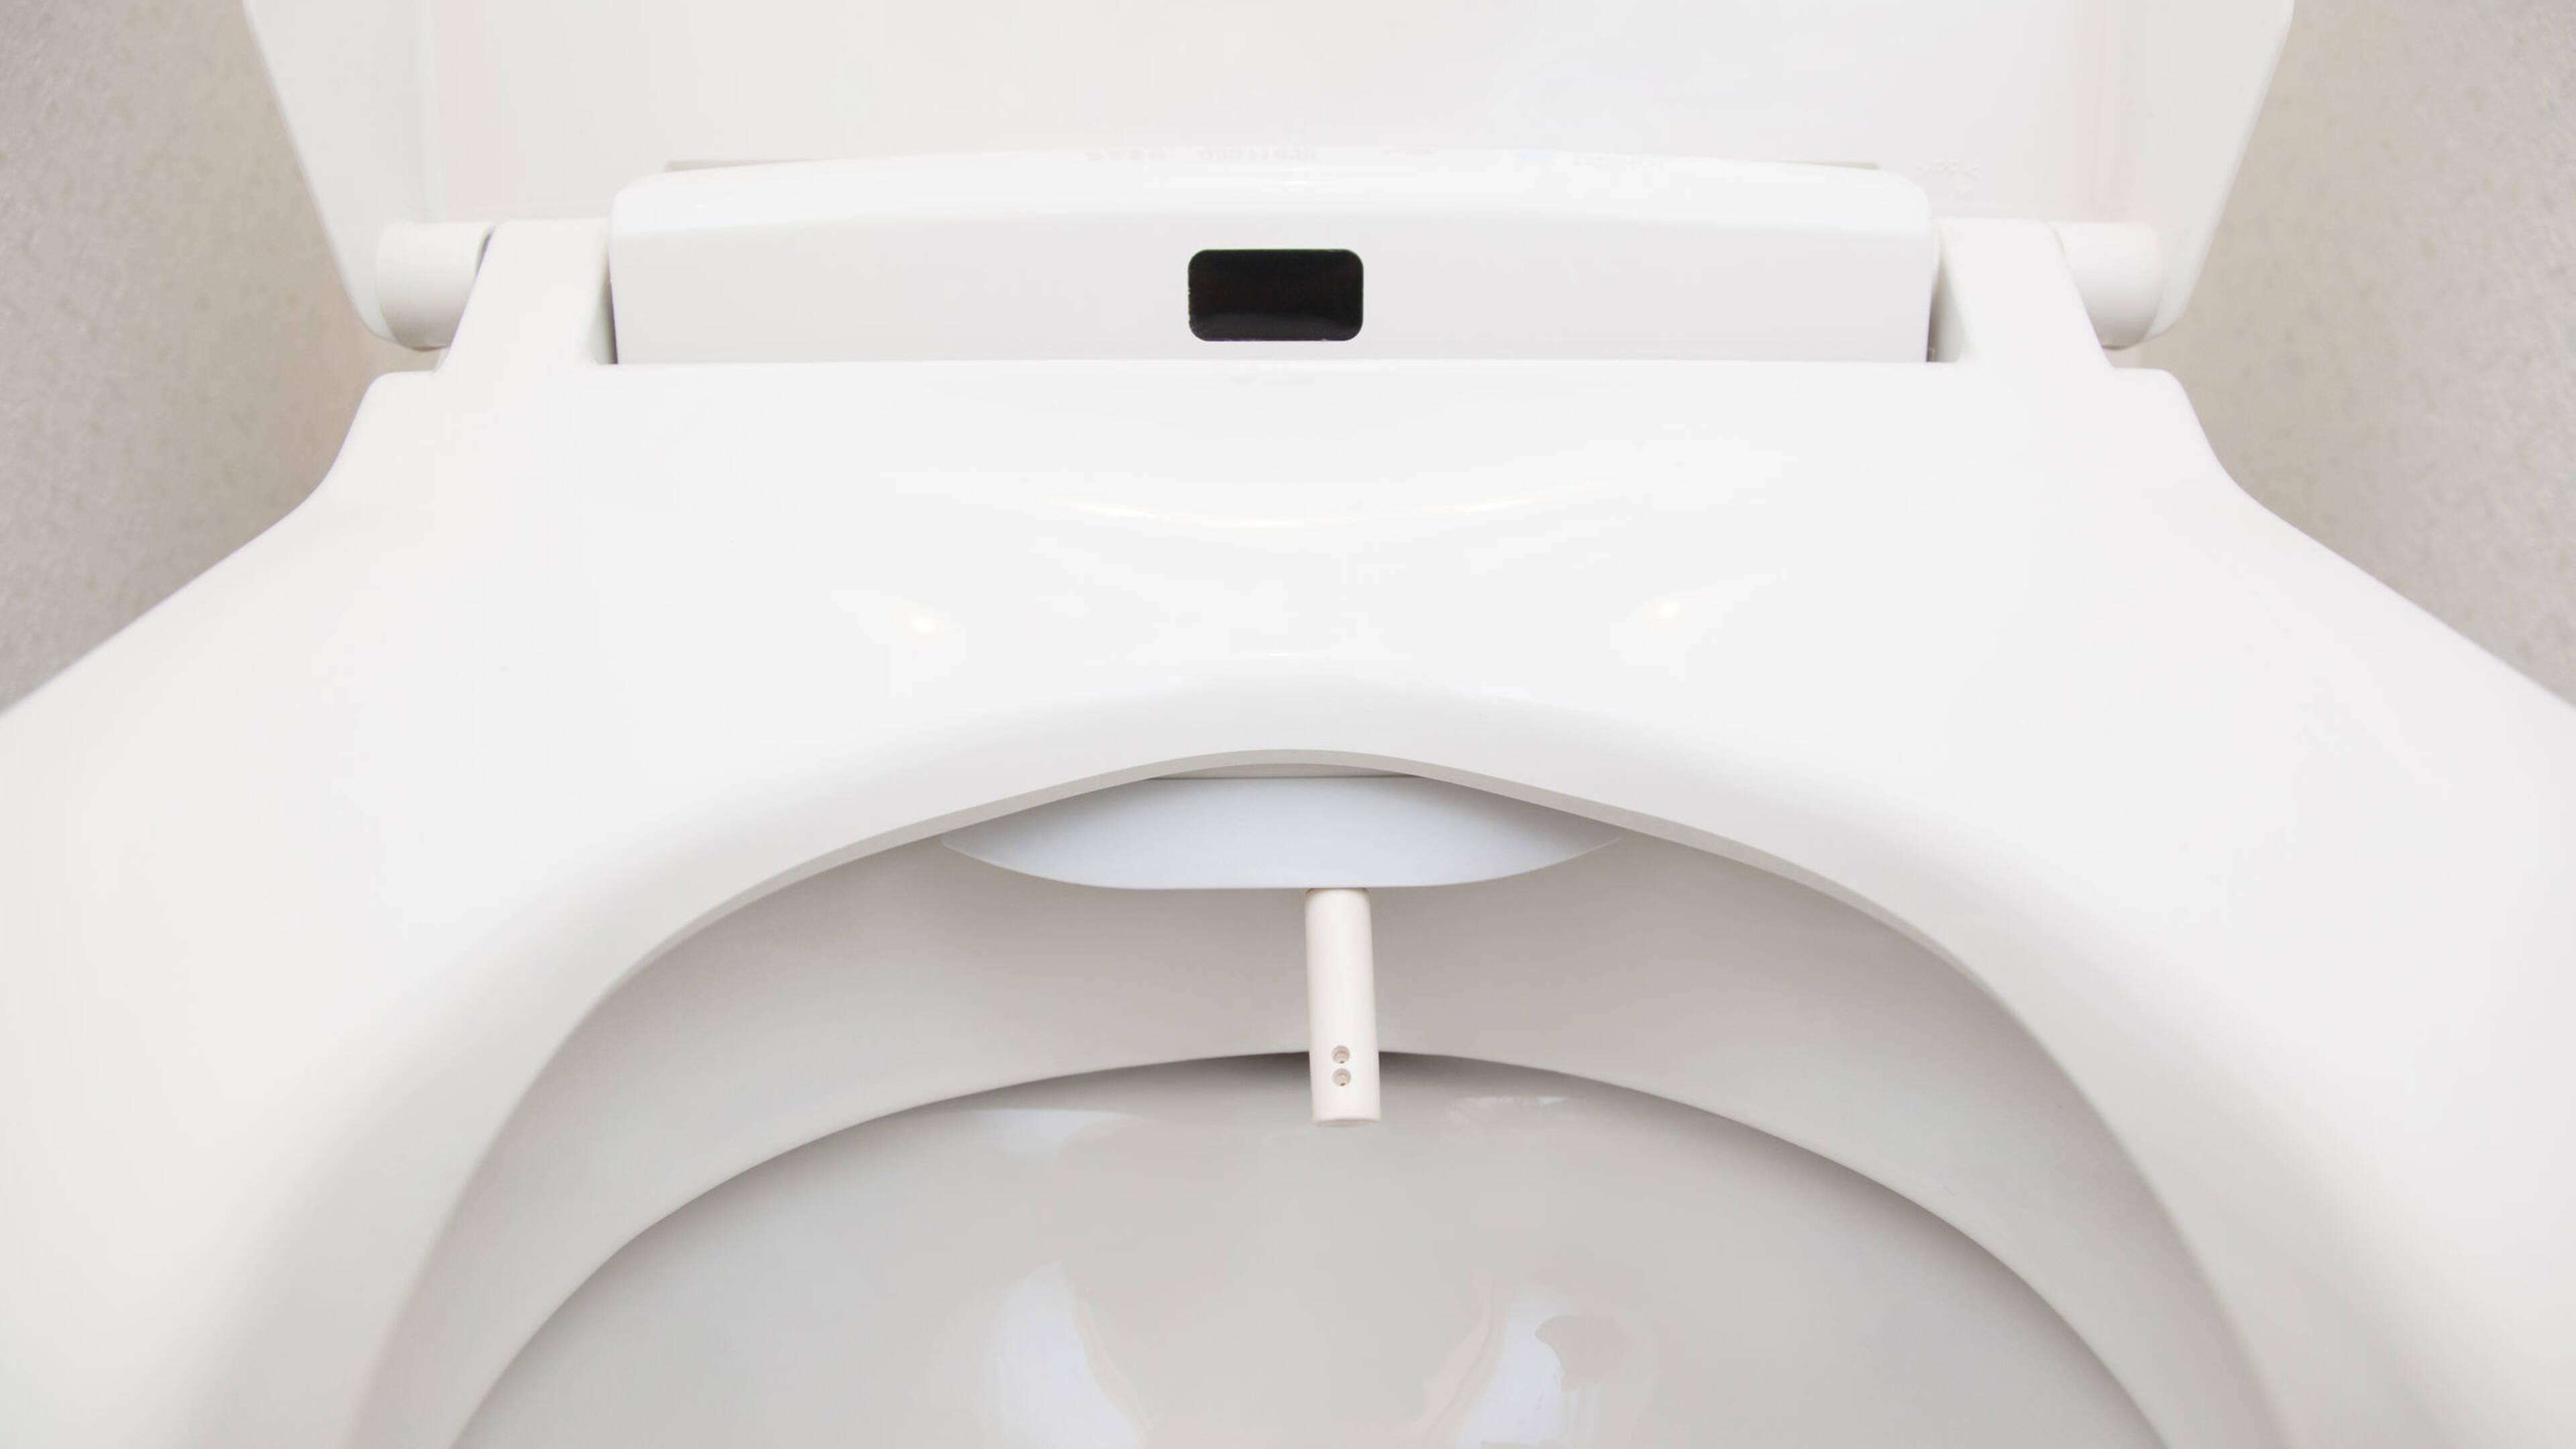 Fantastic Steeds Vaker Billen Afvegen Op Zn Japans Met Water In Pabps2019 Chair Design Images Pabps2019Com